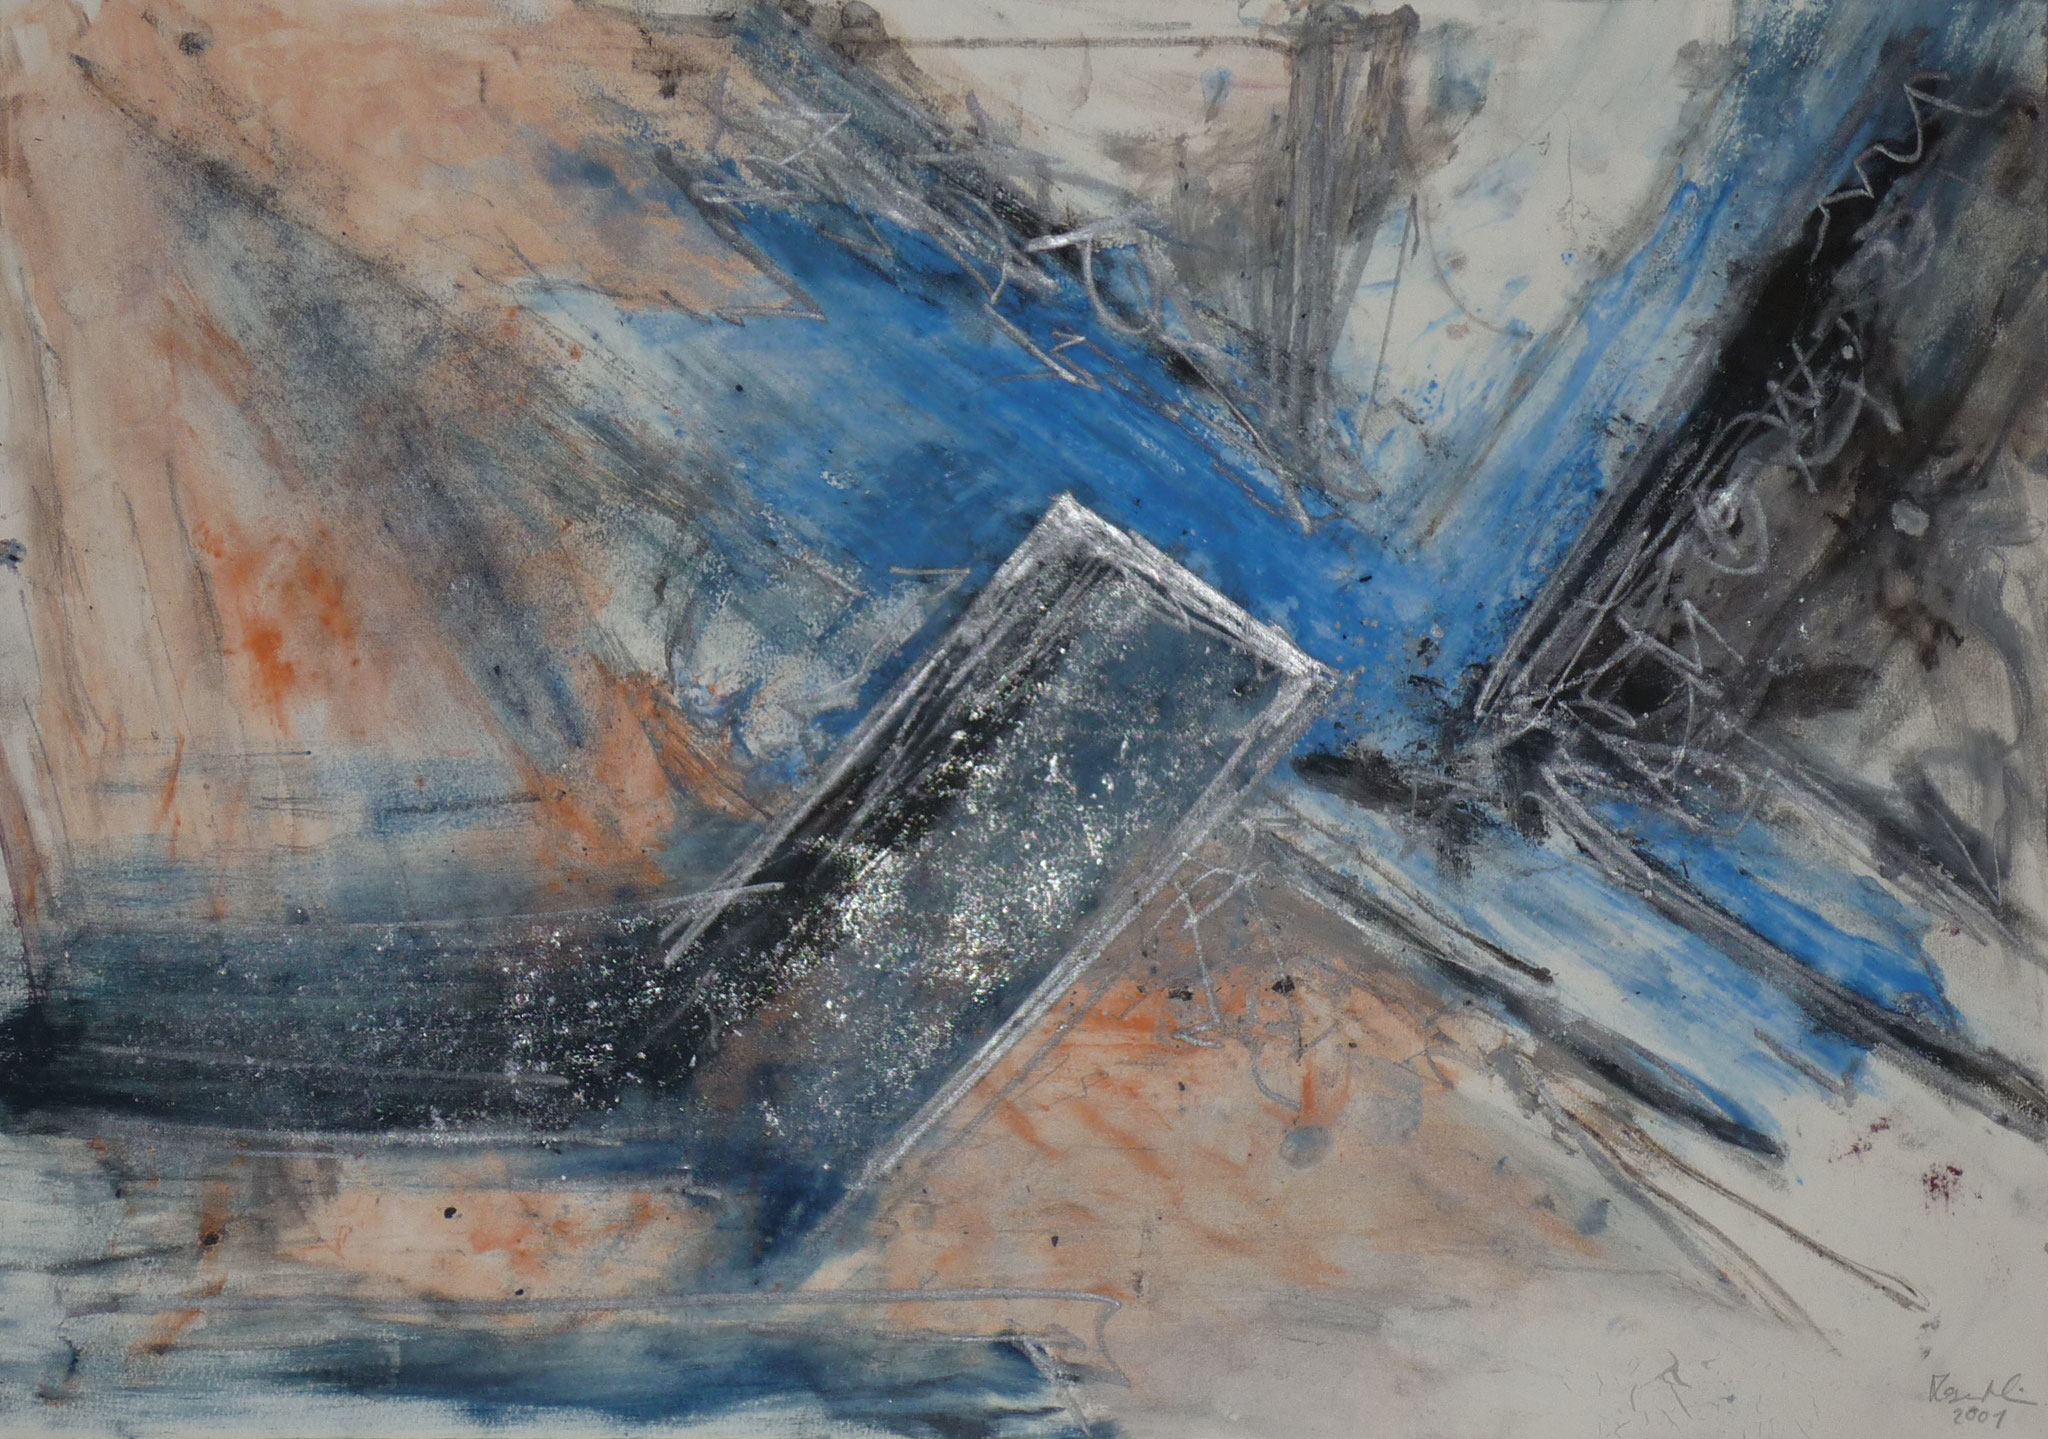 Blauer Winkel, 2001, 59x42cm, Papier